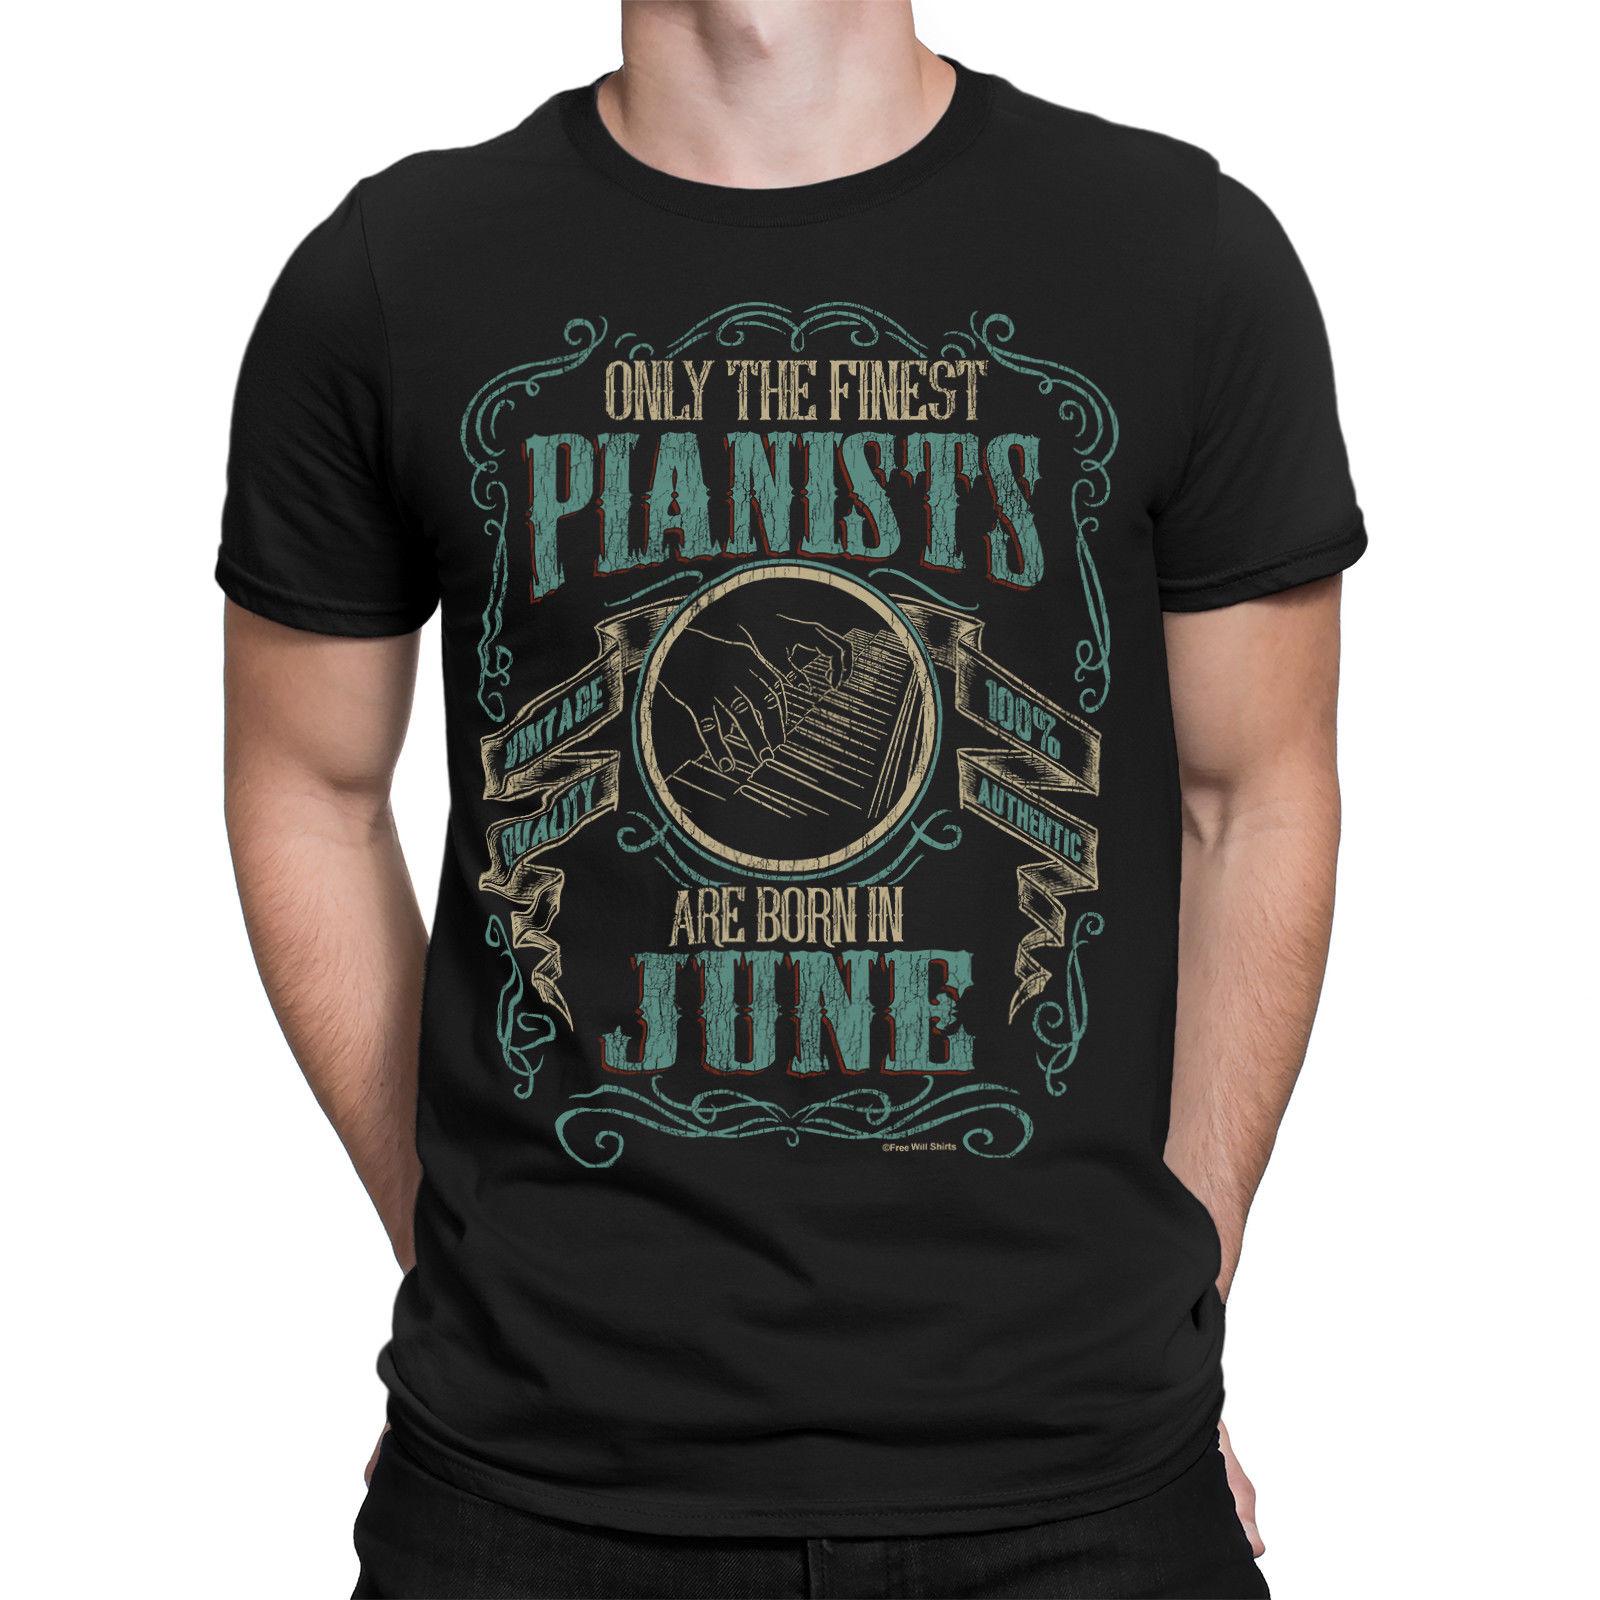 Мужская футболка с пианино, крутая футболка с пианистами, летняя футболка для дня рождения и дня рождения, 2019